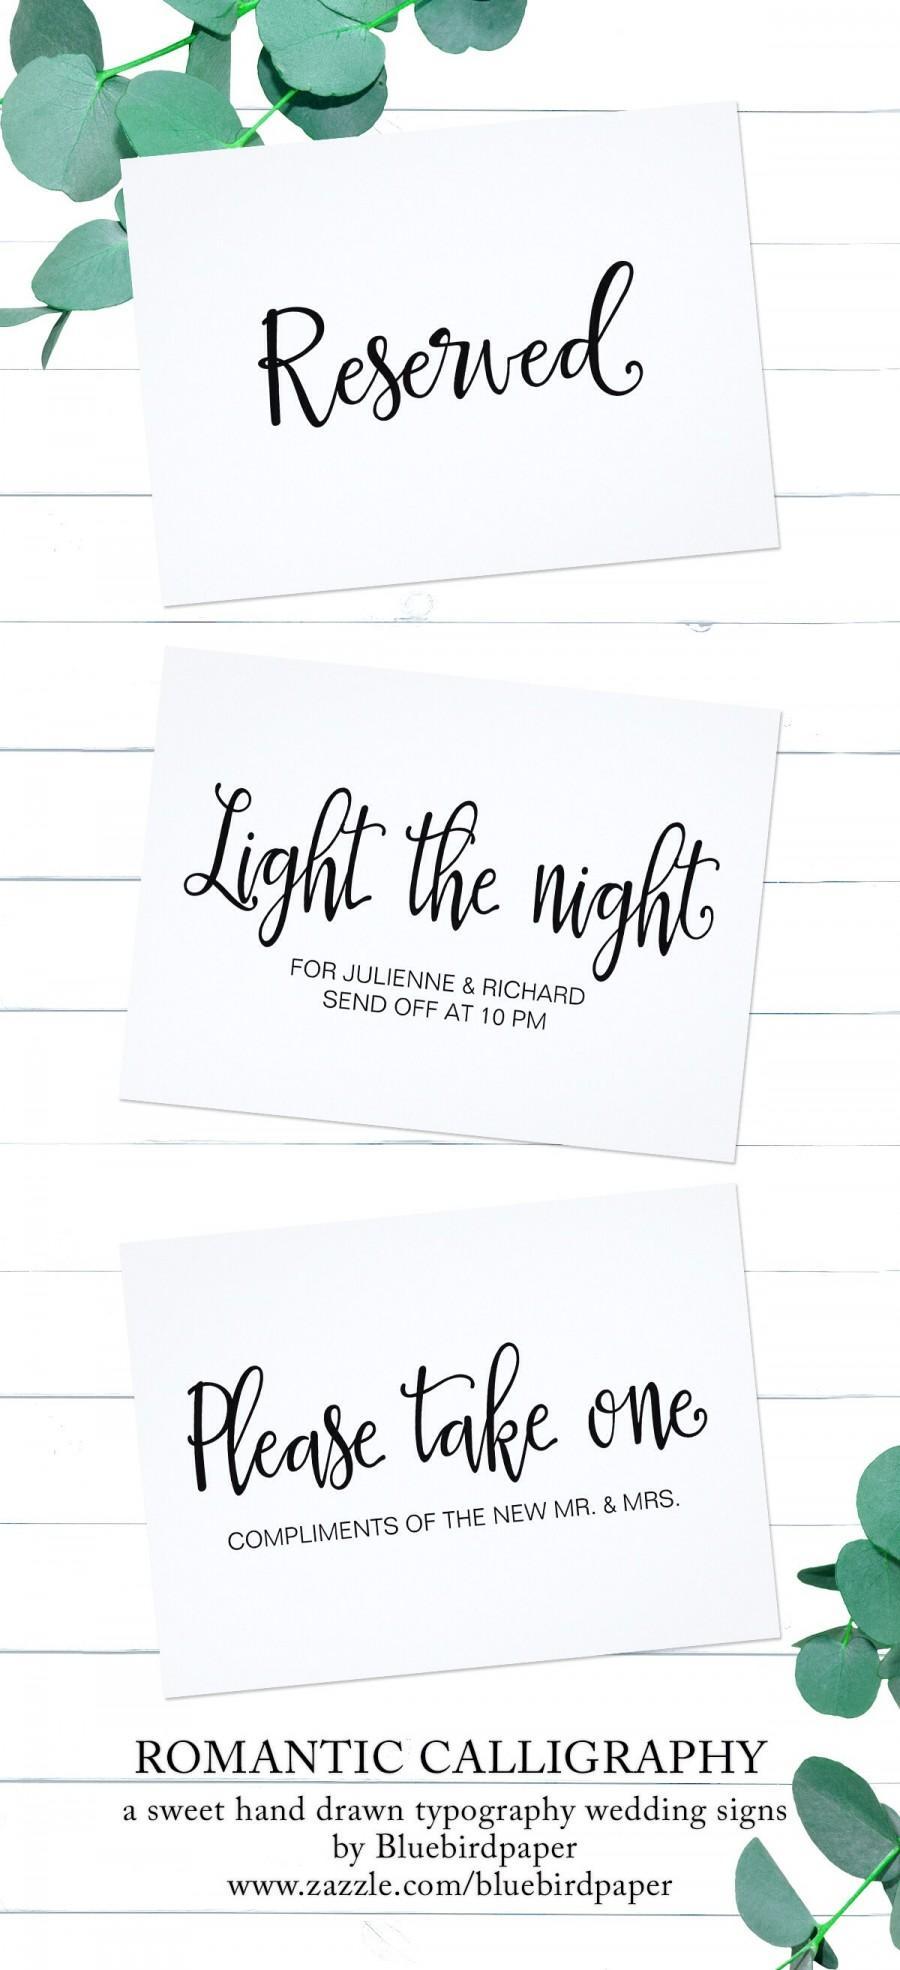 Mariage - Romantic Calligraphy Wedding Signage